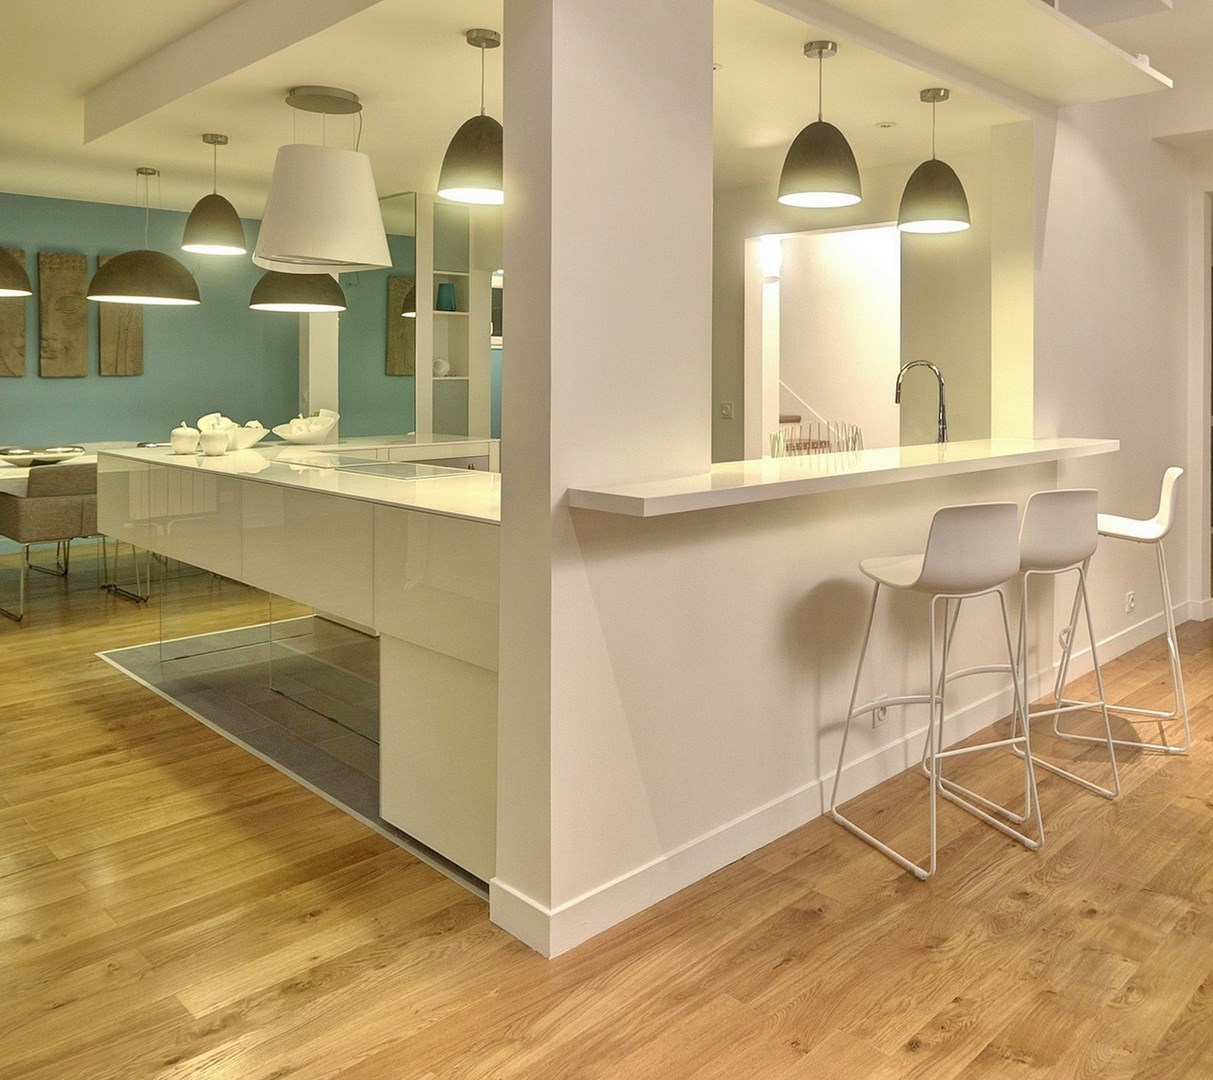 maison renovation luxe bar cuisine lago laque blanche corian agence avous